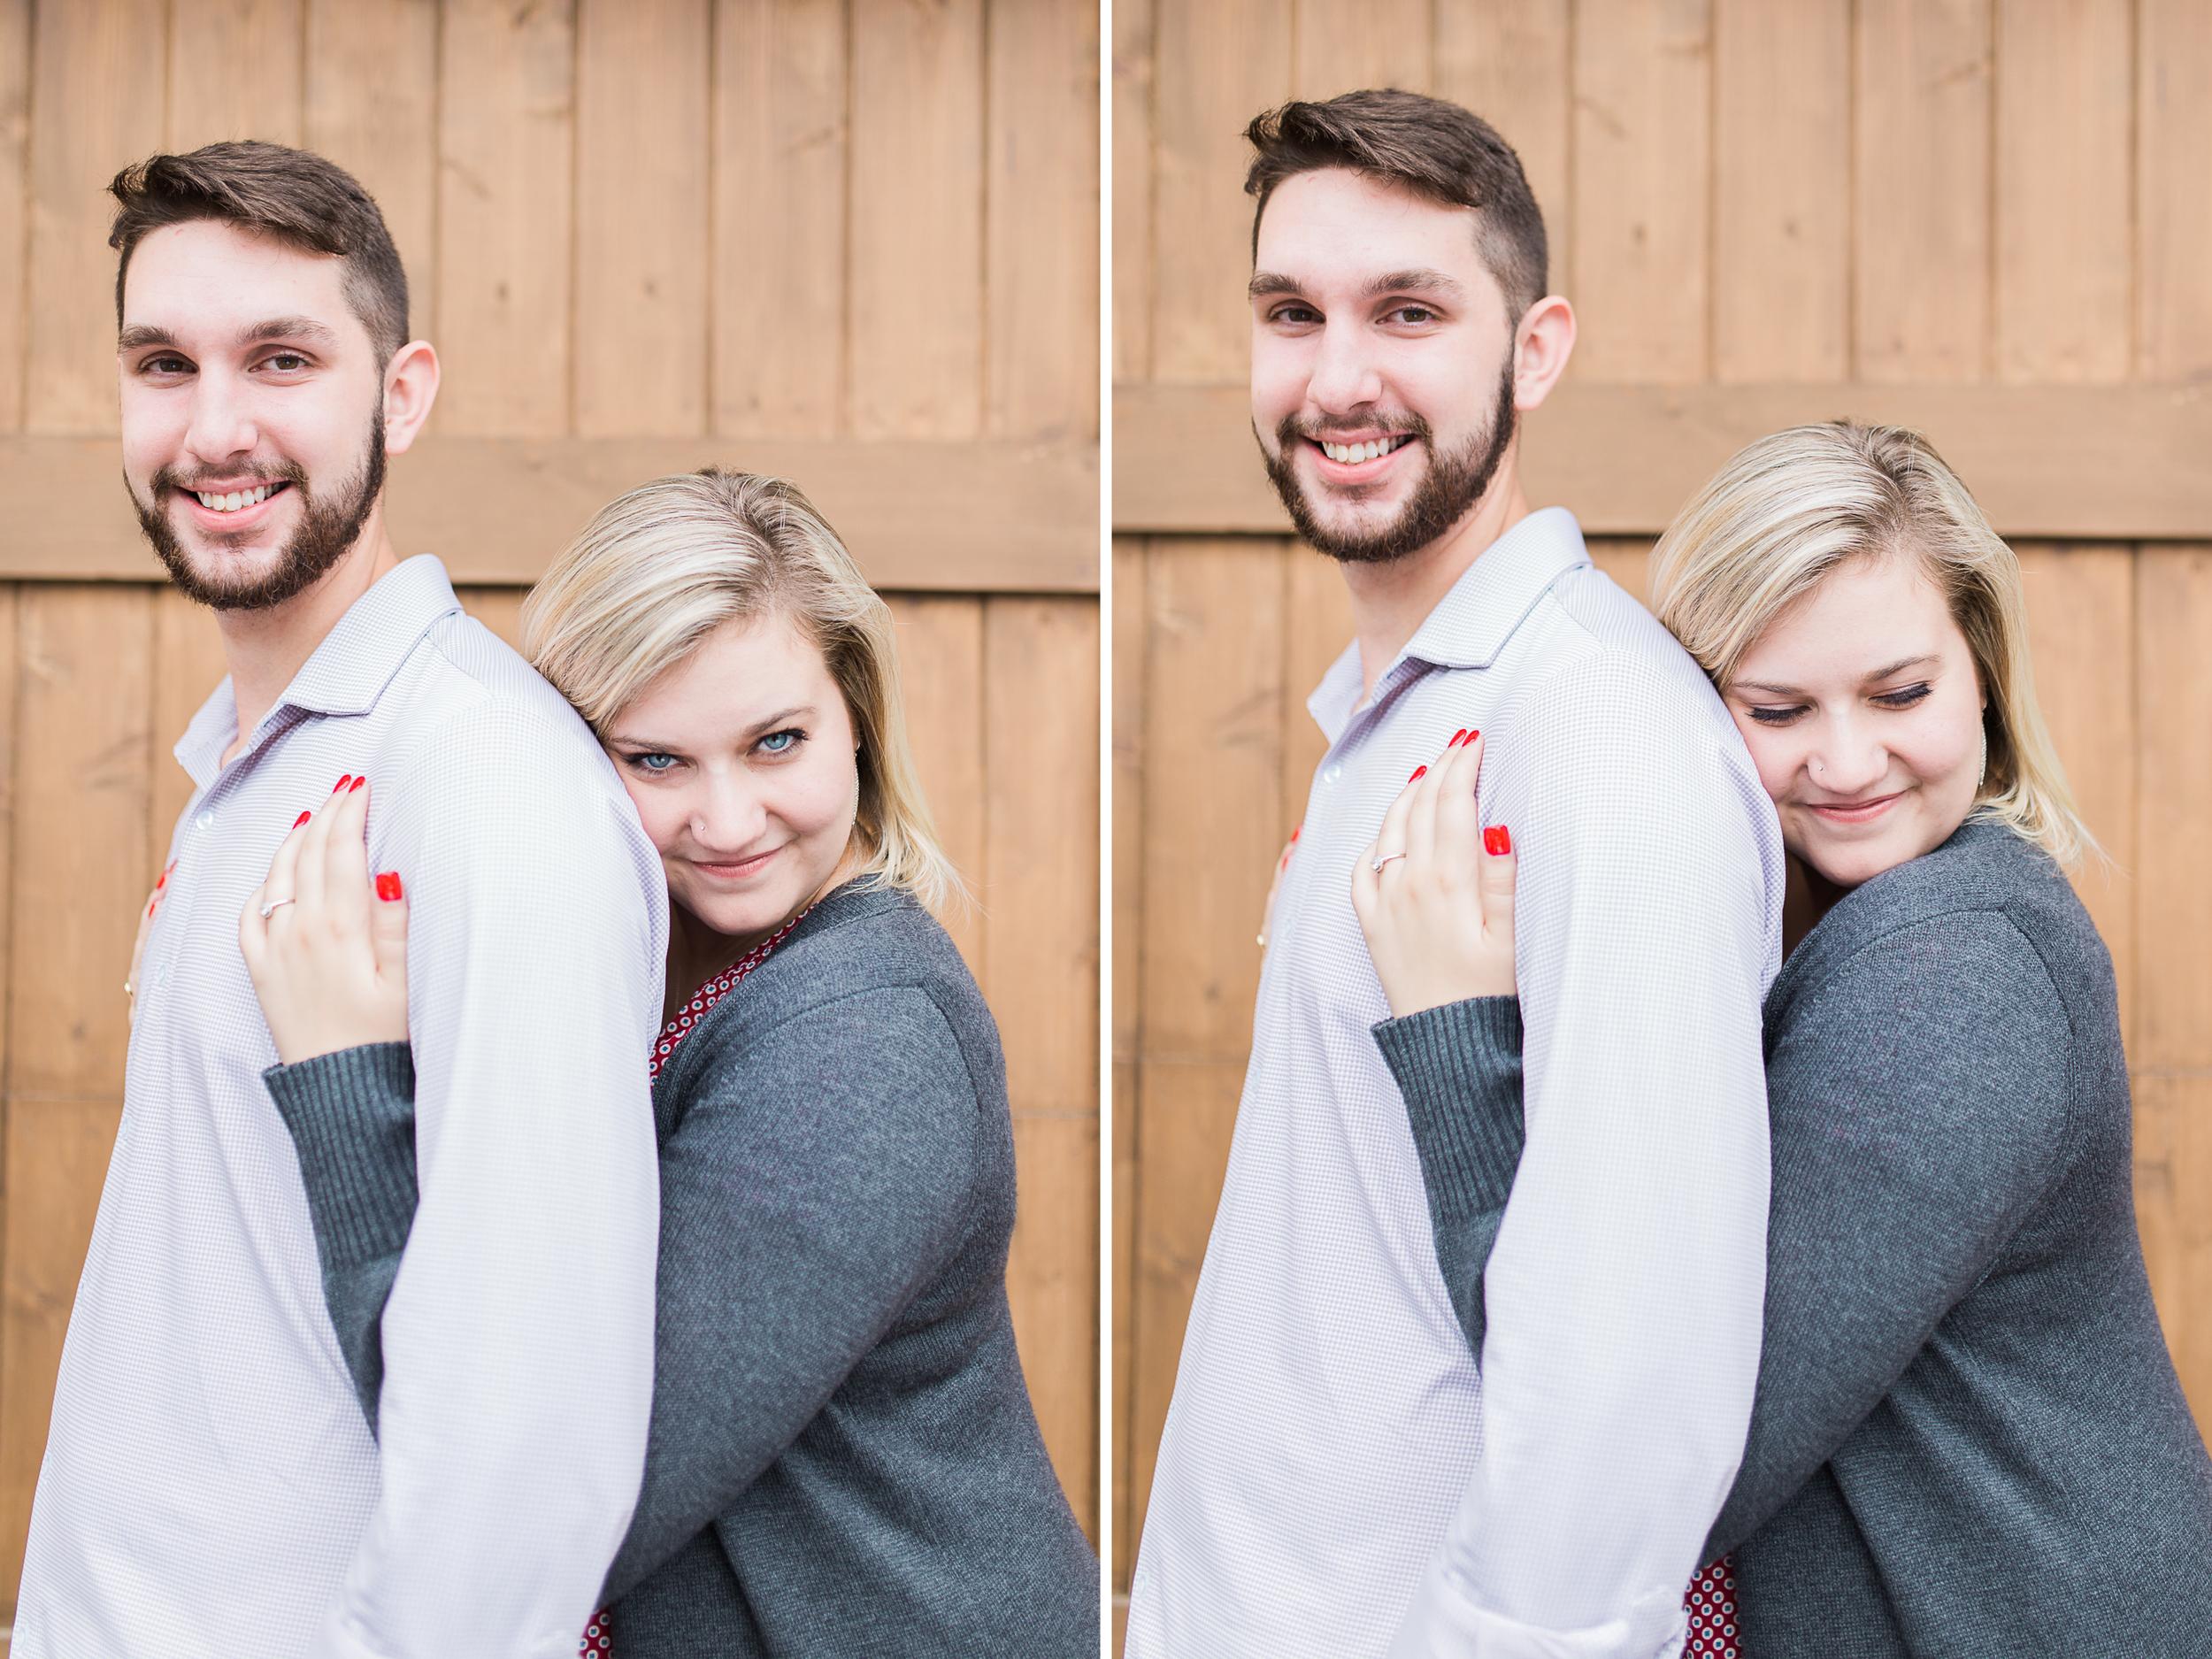 the woodlands houston texas engagement proposal couple wedding portrait adventure photographer photography